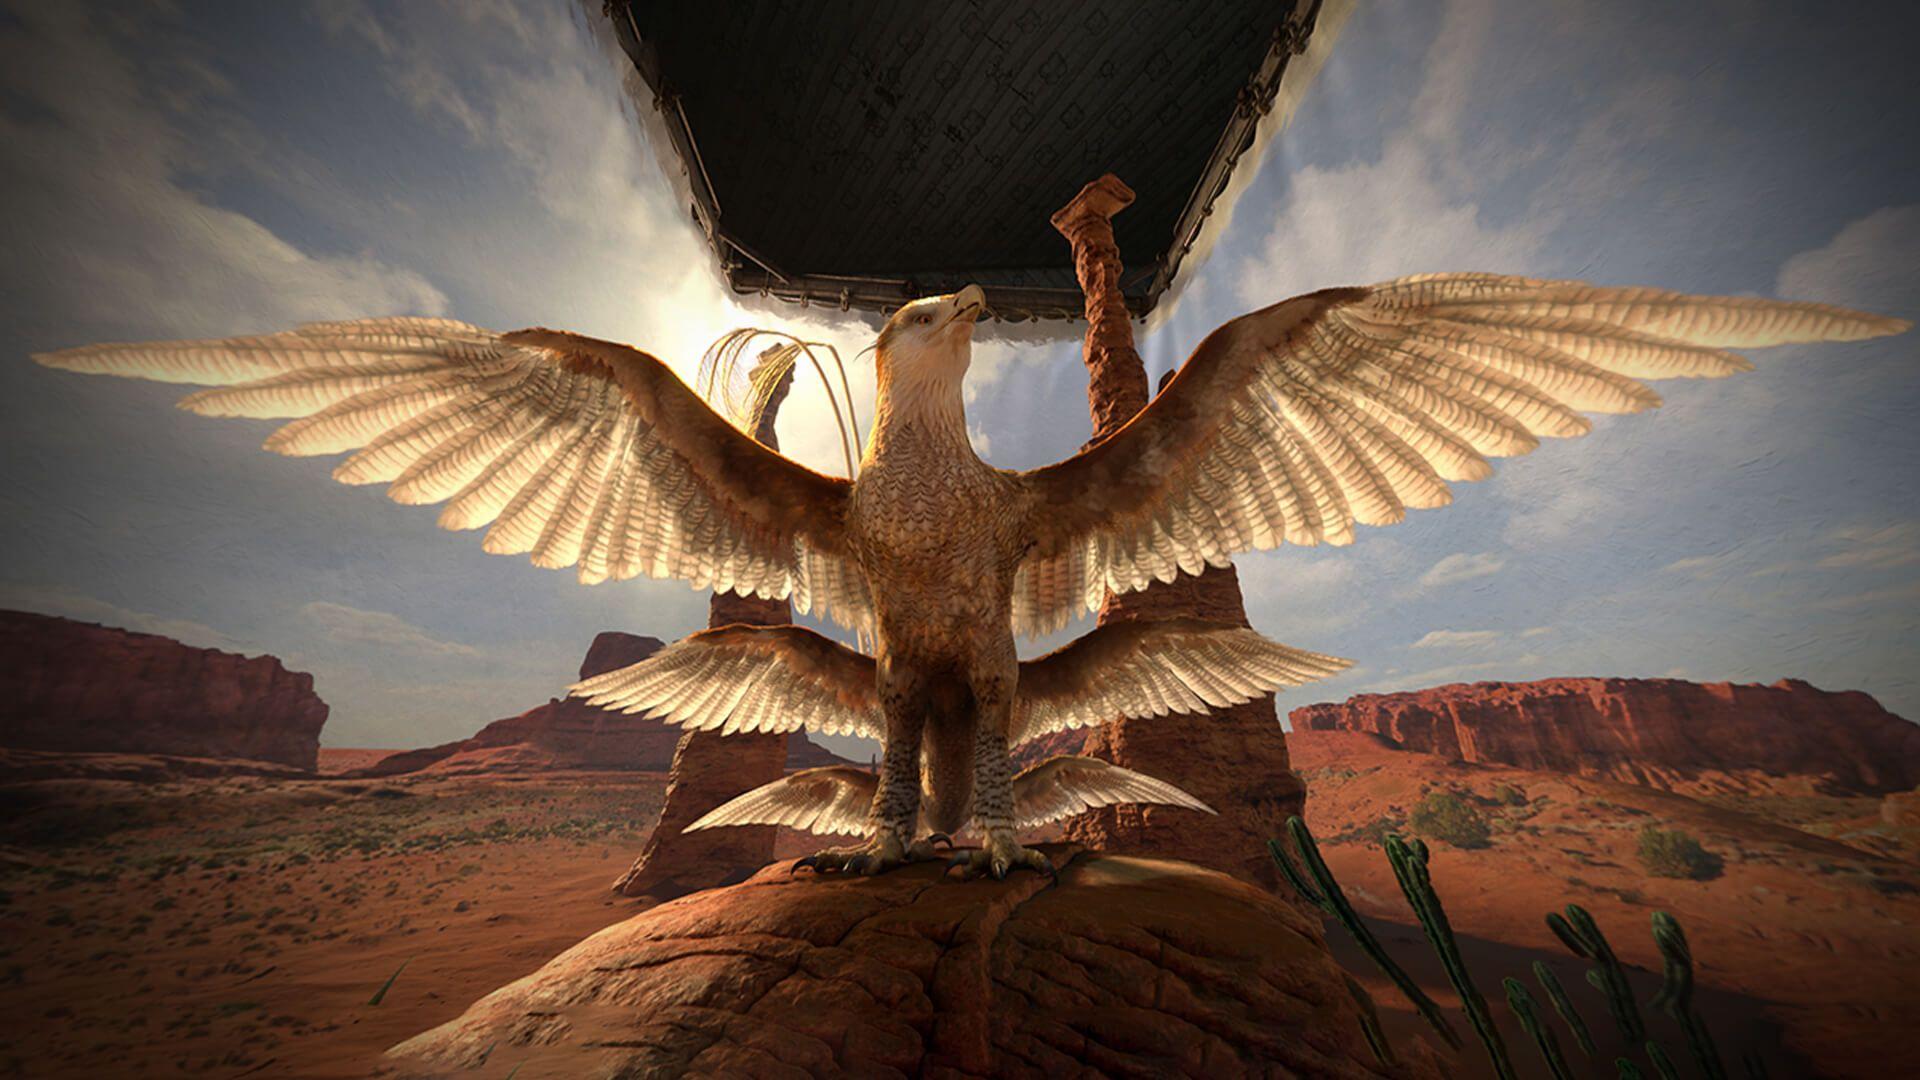 Thunderbird Fantastic Beasts Wallpaper Widescreen On Hd